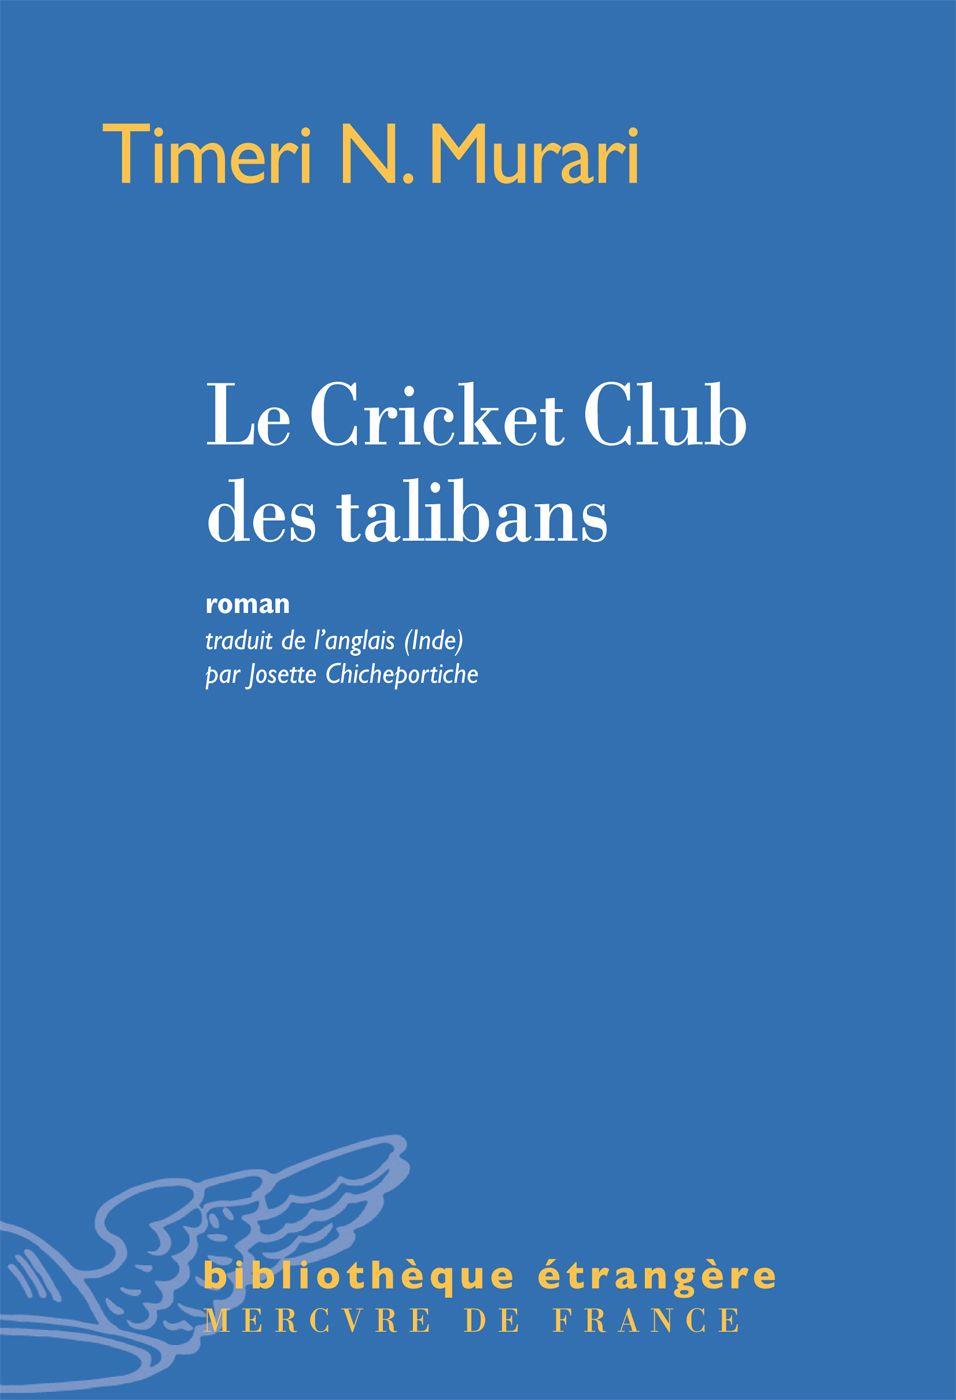 Le Cricket Club des talibans | Murari, Timeri N. (1942-....). Auteur